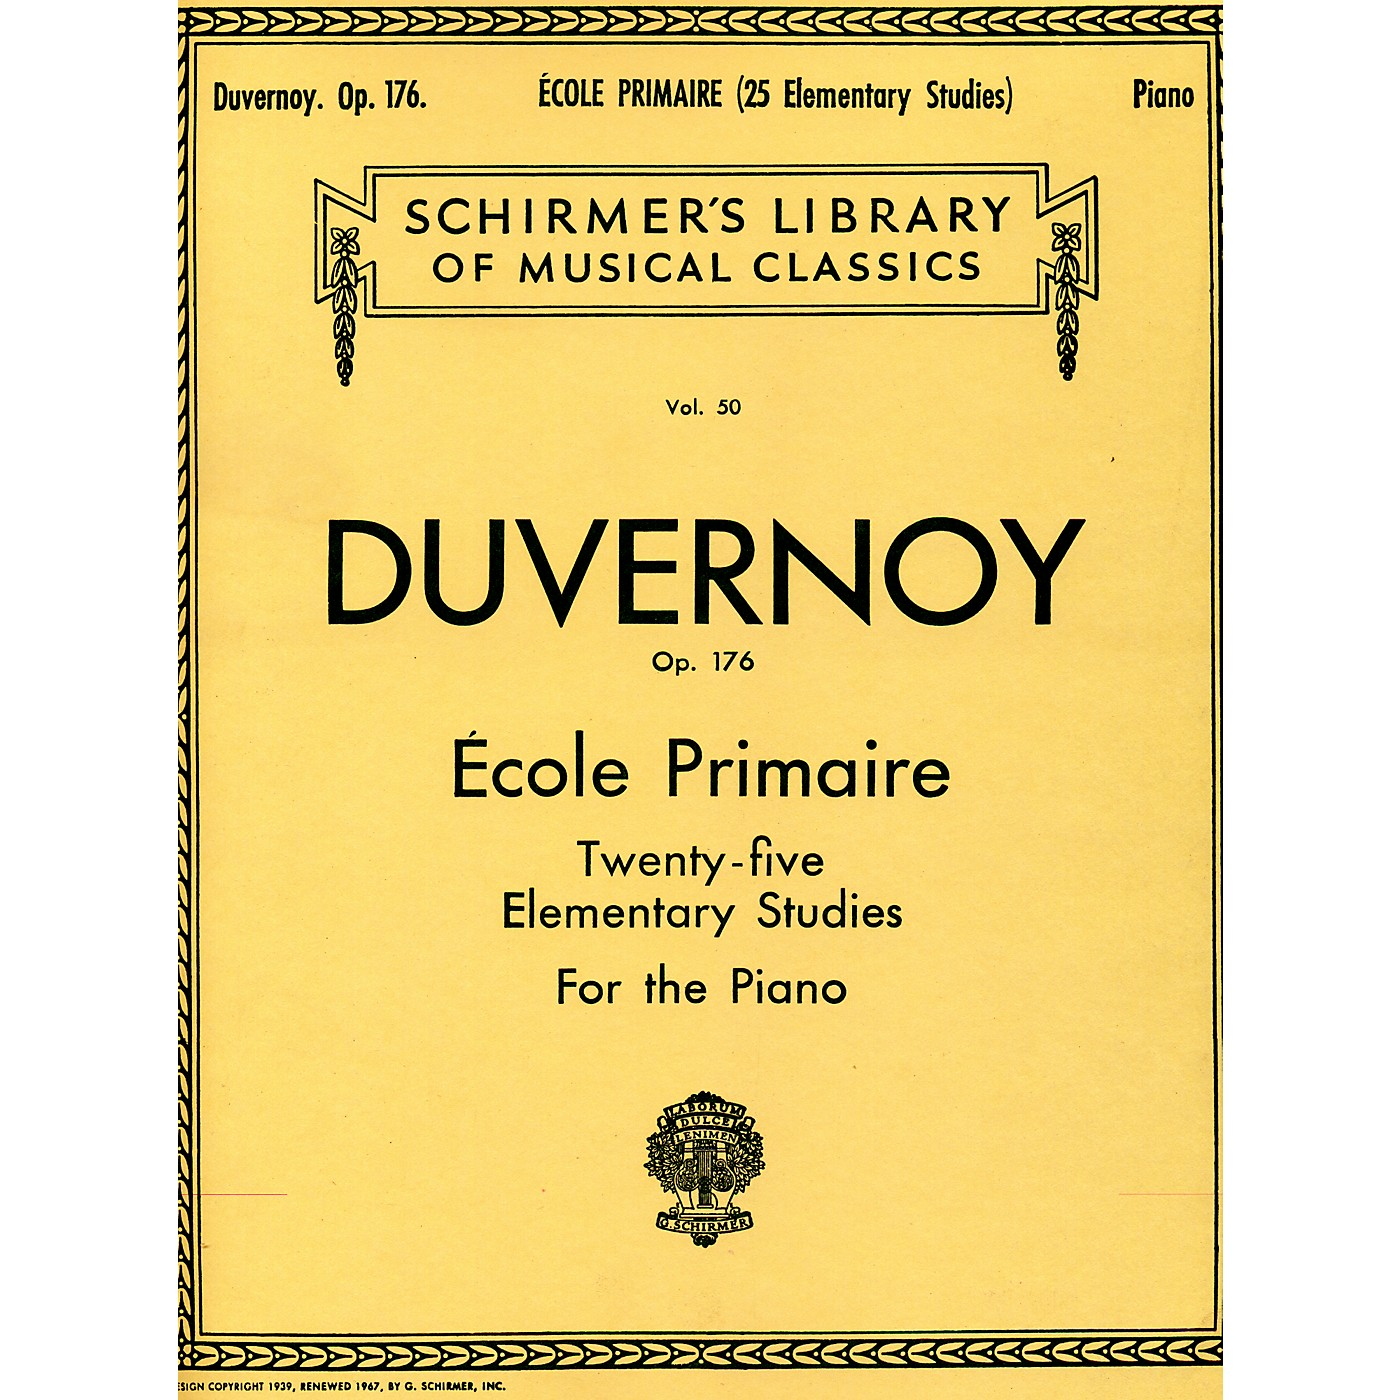 G. Schirmer Ecole Primaire Op 176 Piano Twenty Five Elementary Studies By Duvernoy thumbnail